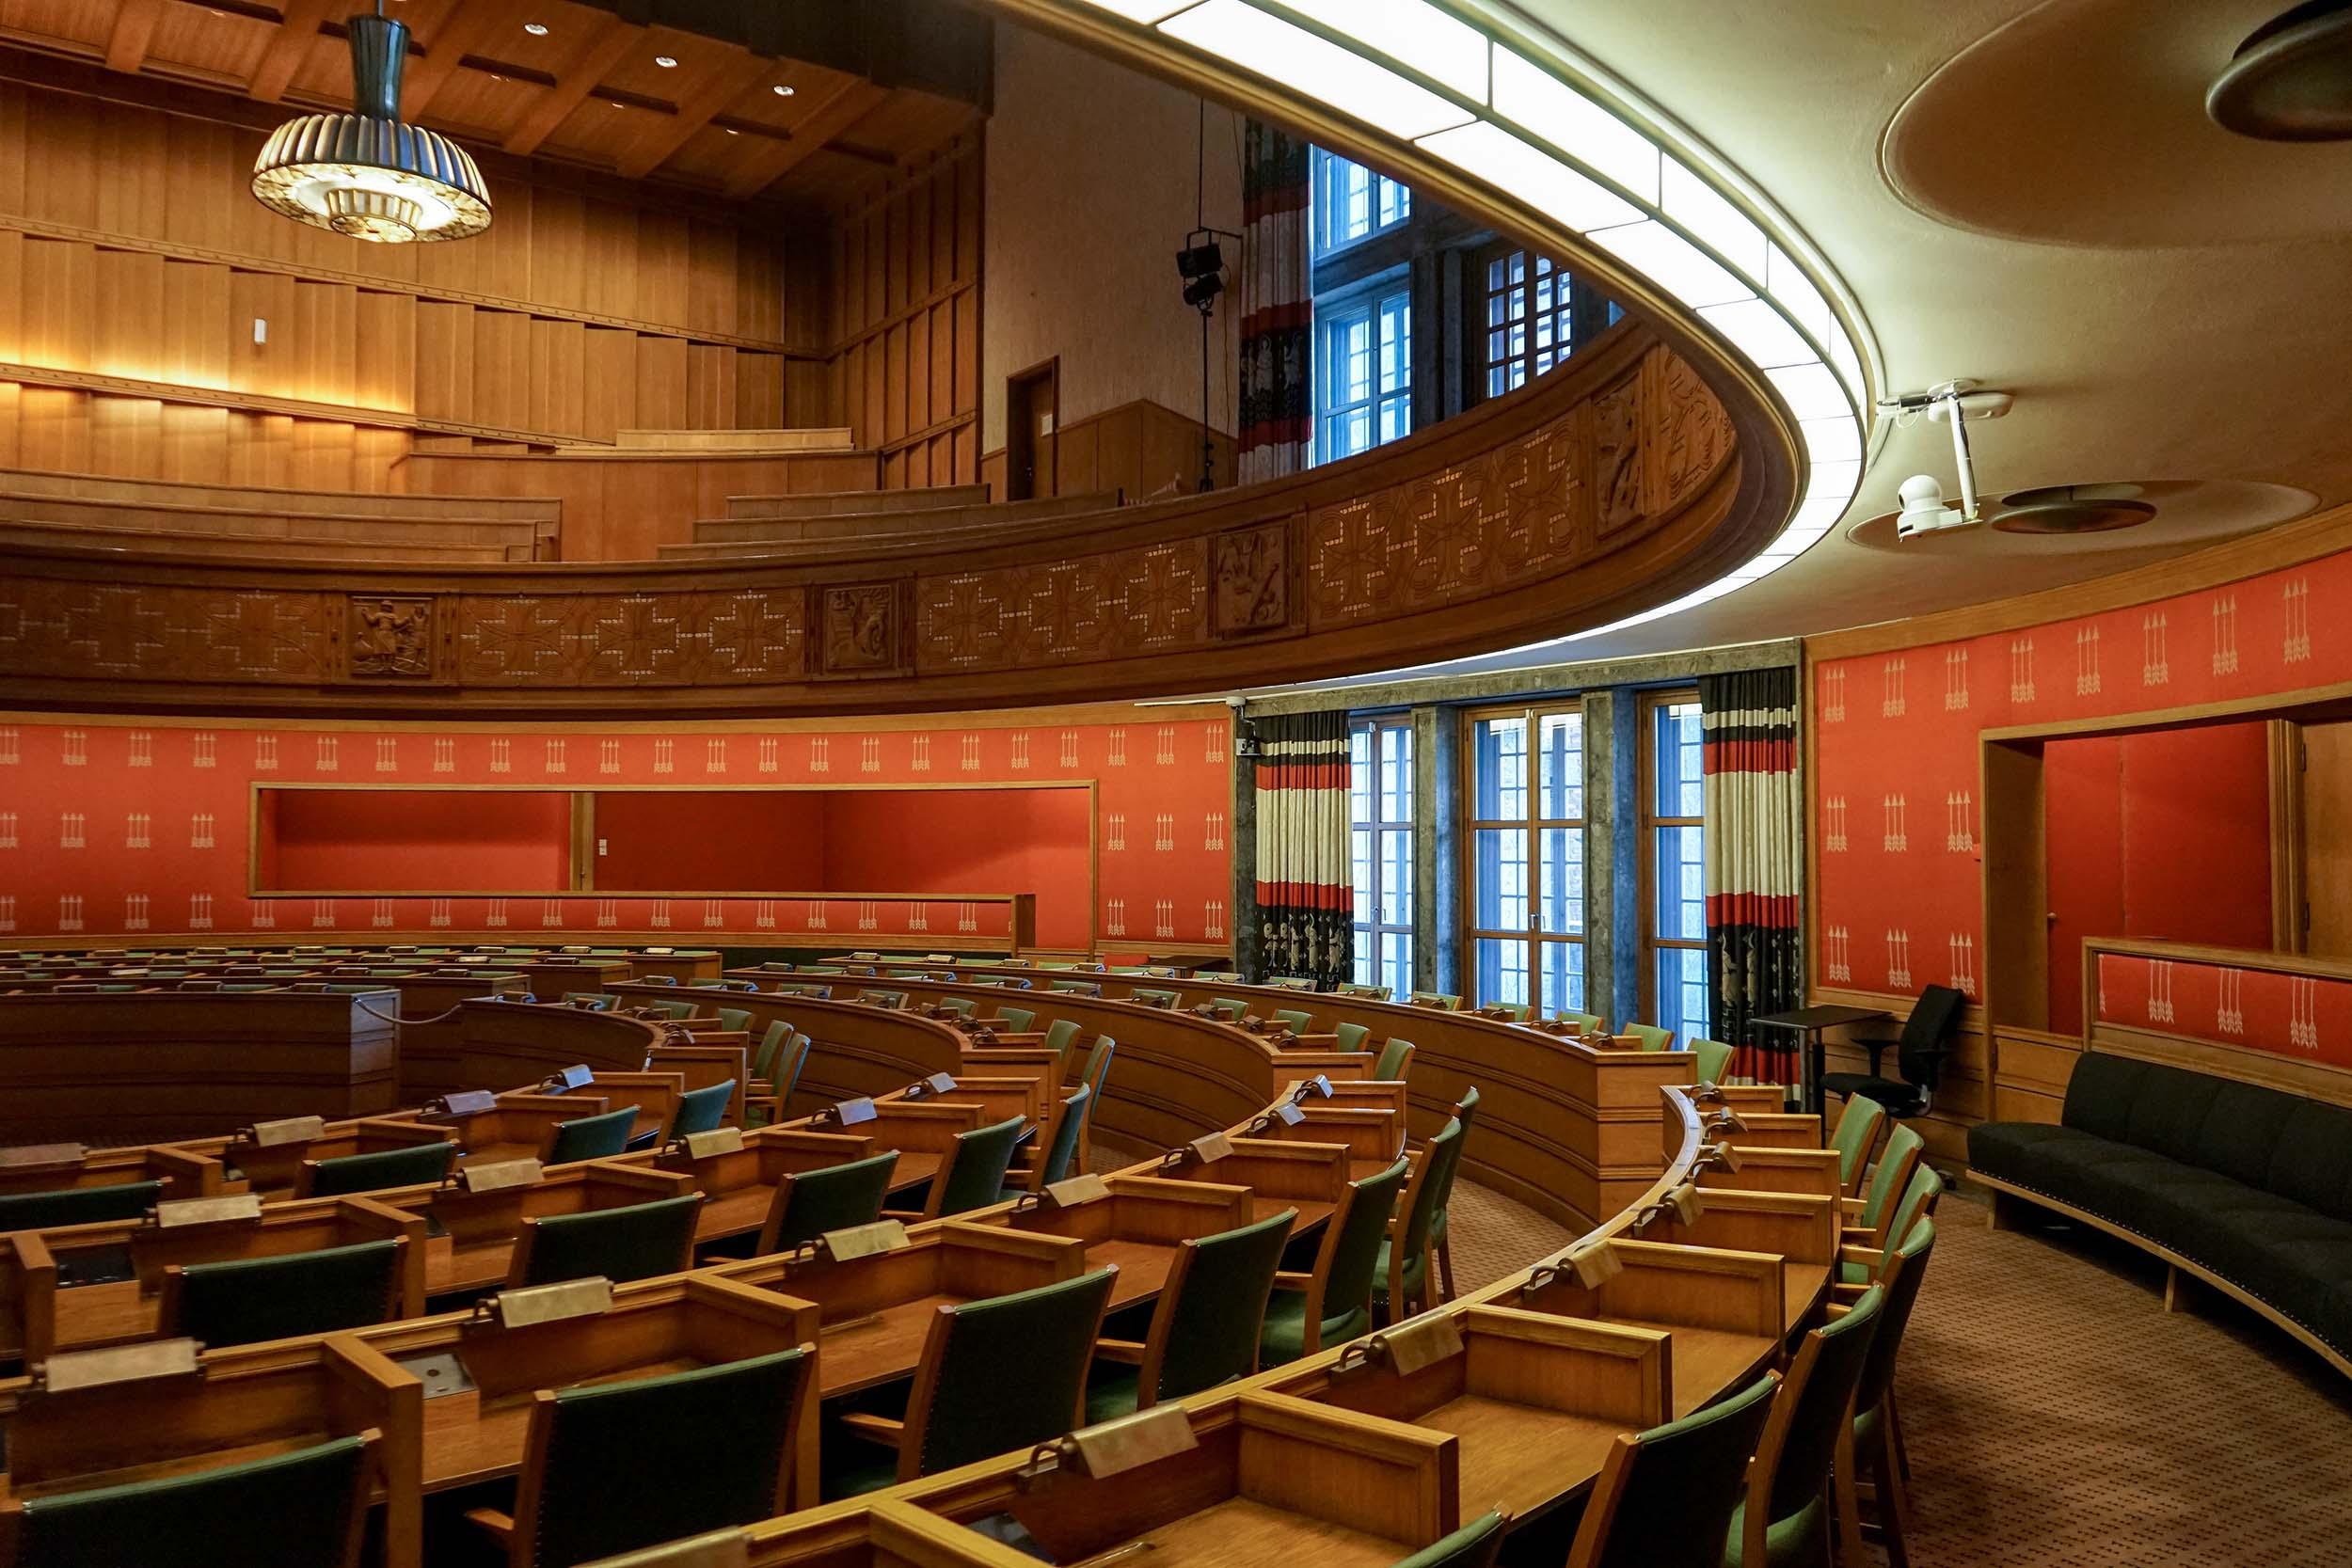 Assembly room中與會議員的位置